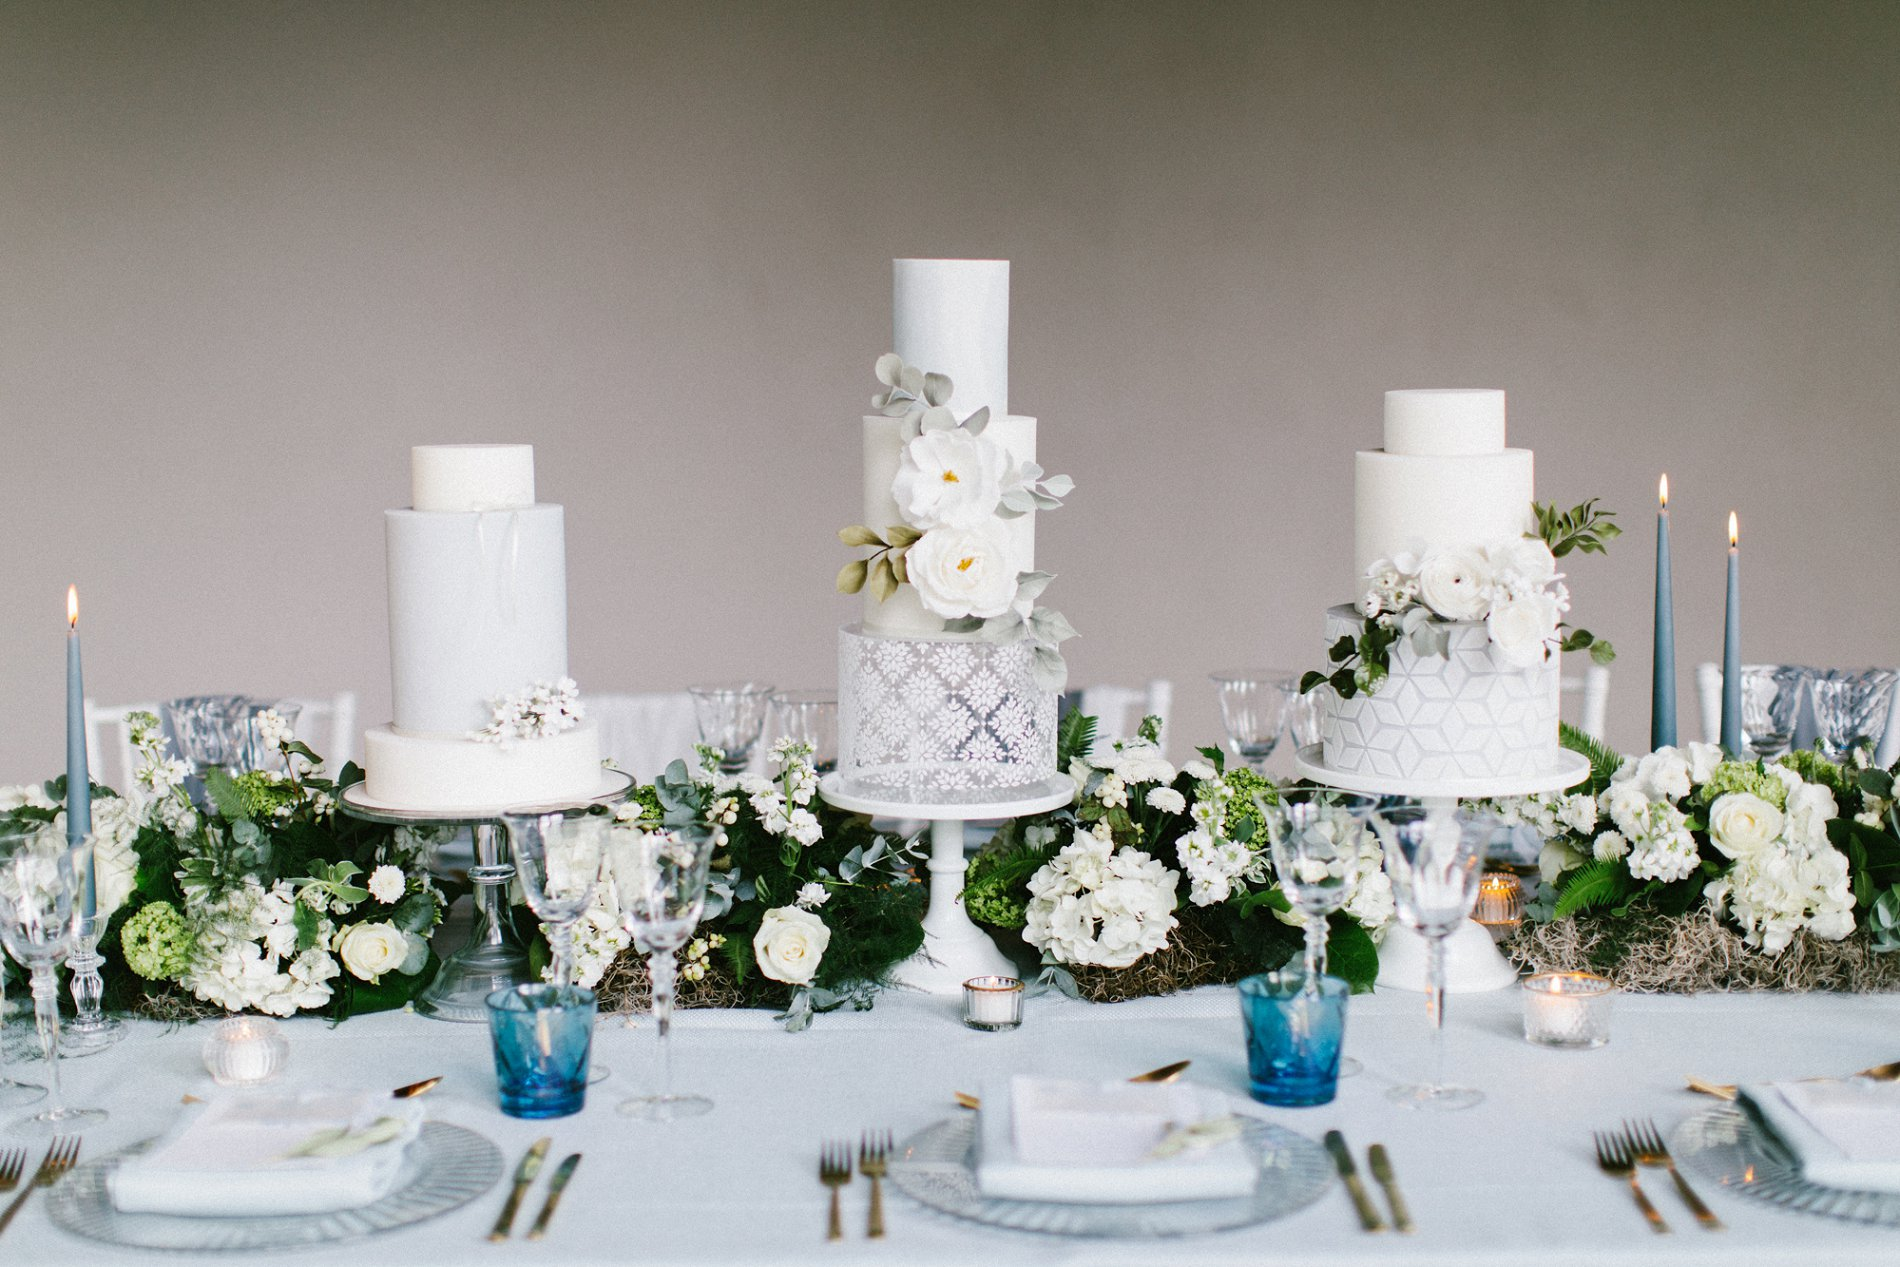 An Intimate Fine Art Wedding Shoot at Newby Hall (c) Melissa Beattie Photography (31)